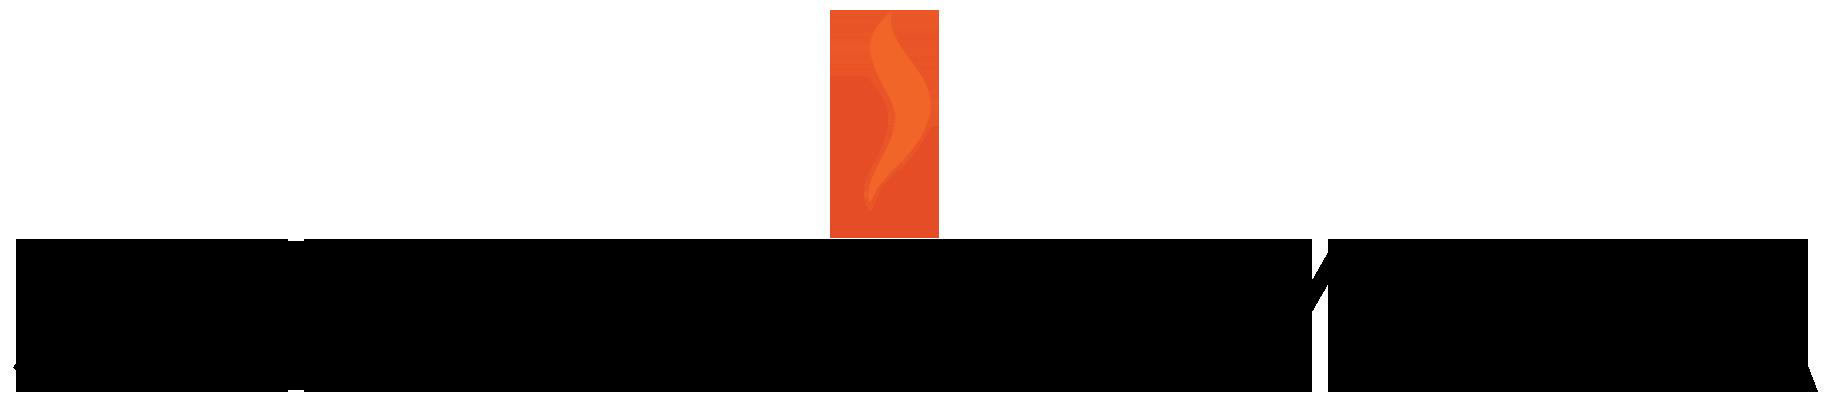 Sleekfire Media Logo 1 Wide.png